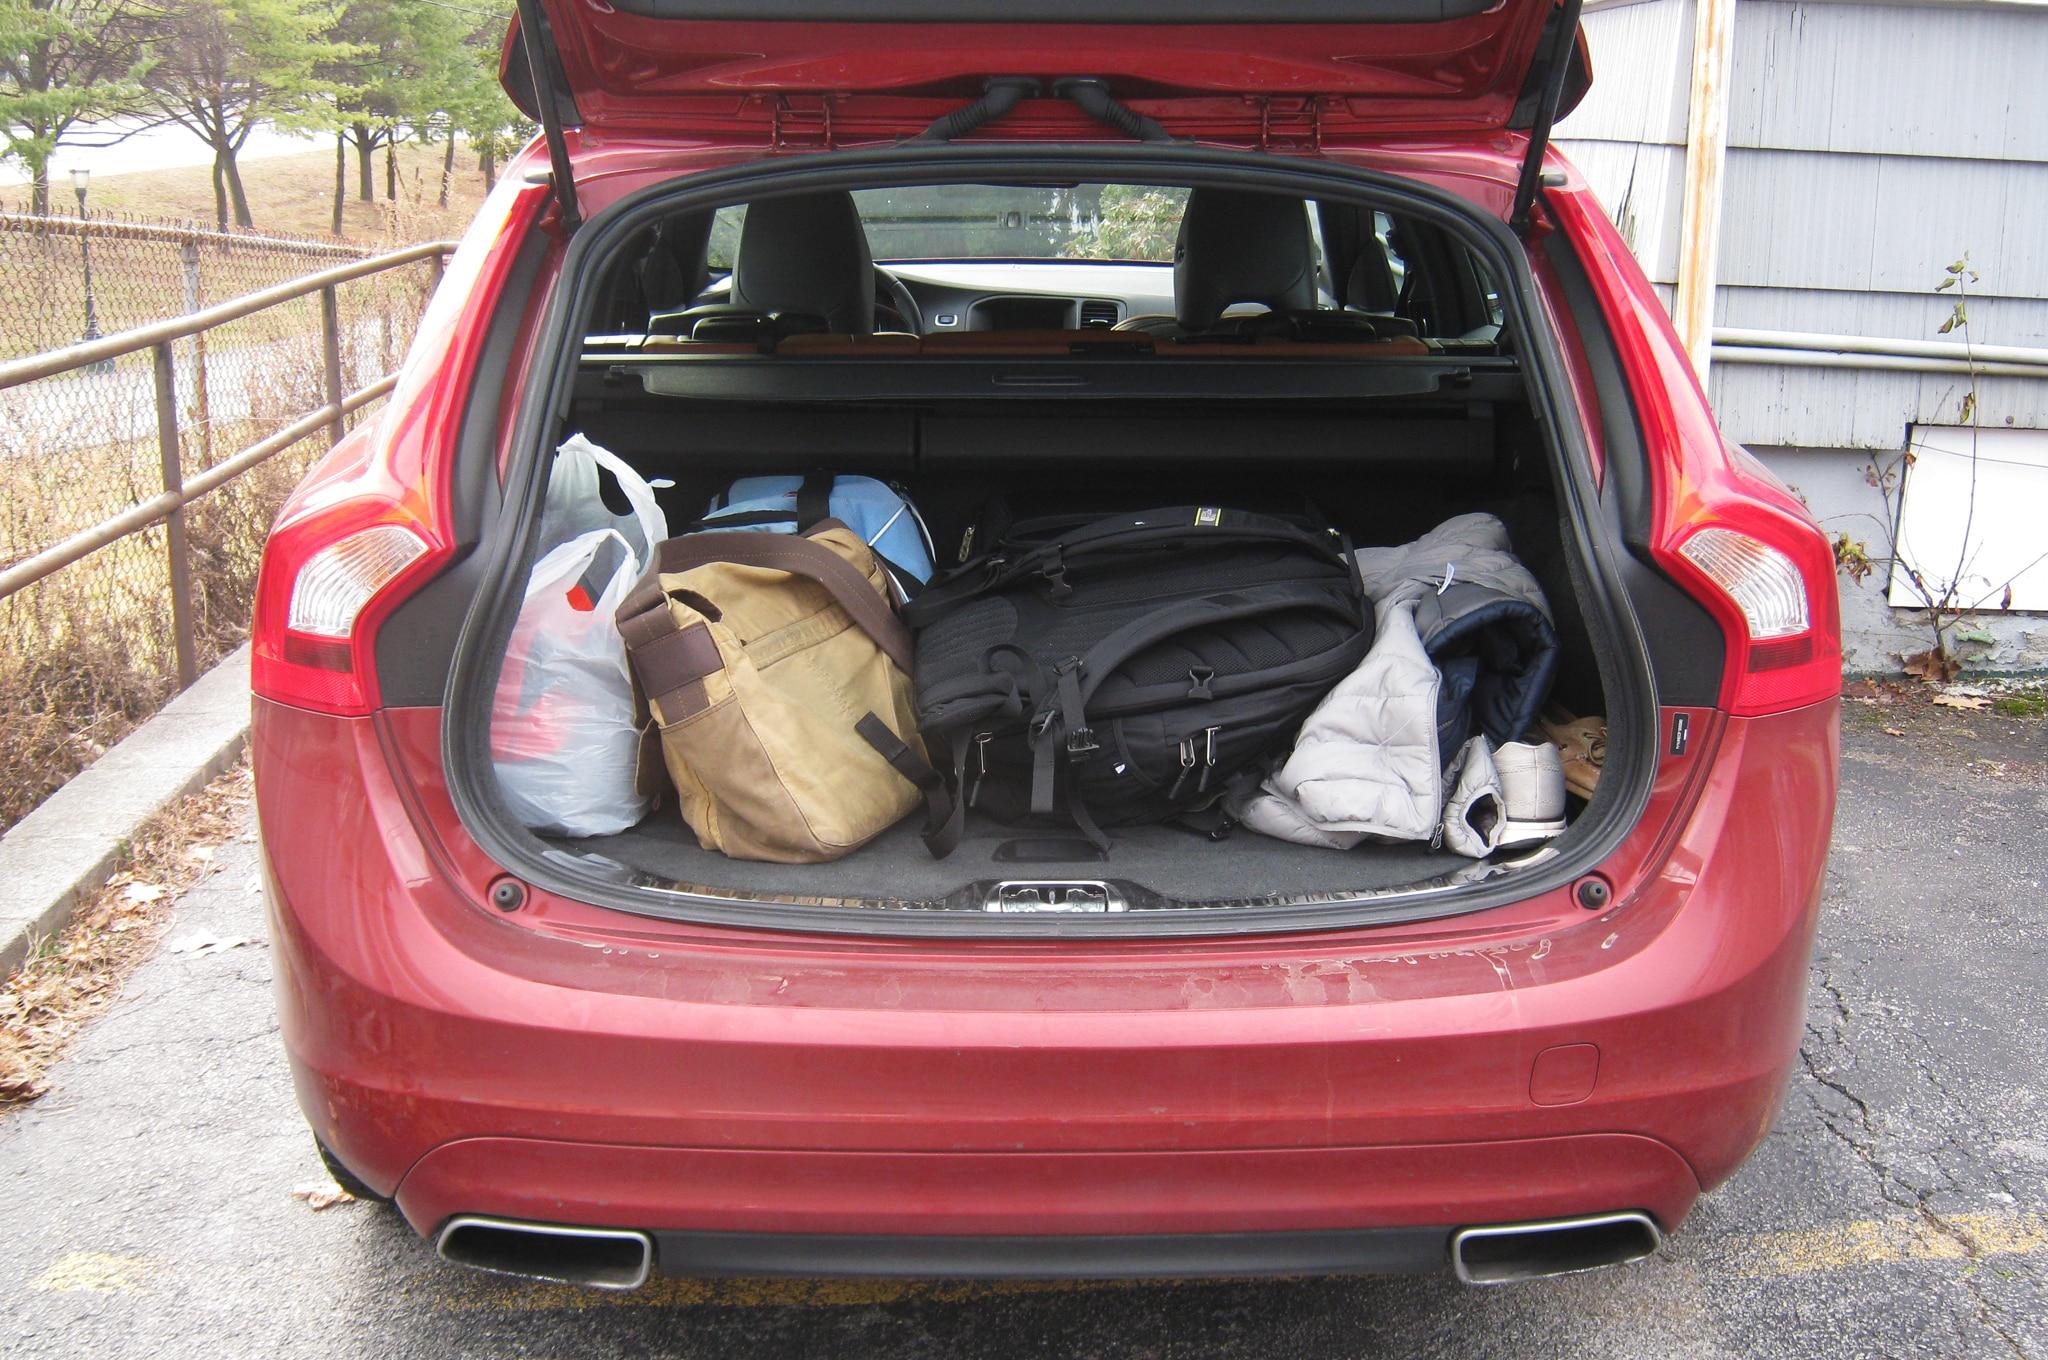 2015 Volvo V60 T5 - Four Seasons Wrap-Up